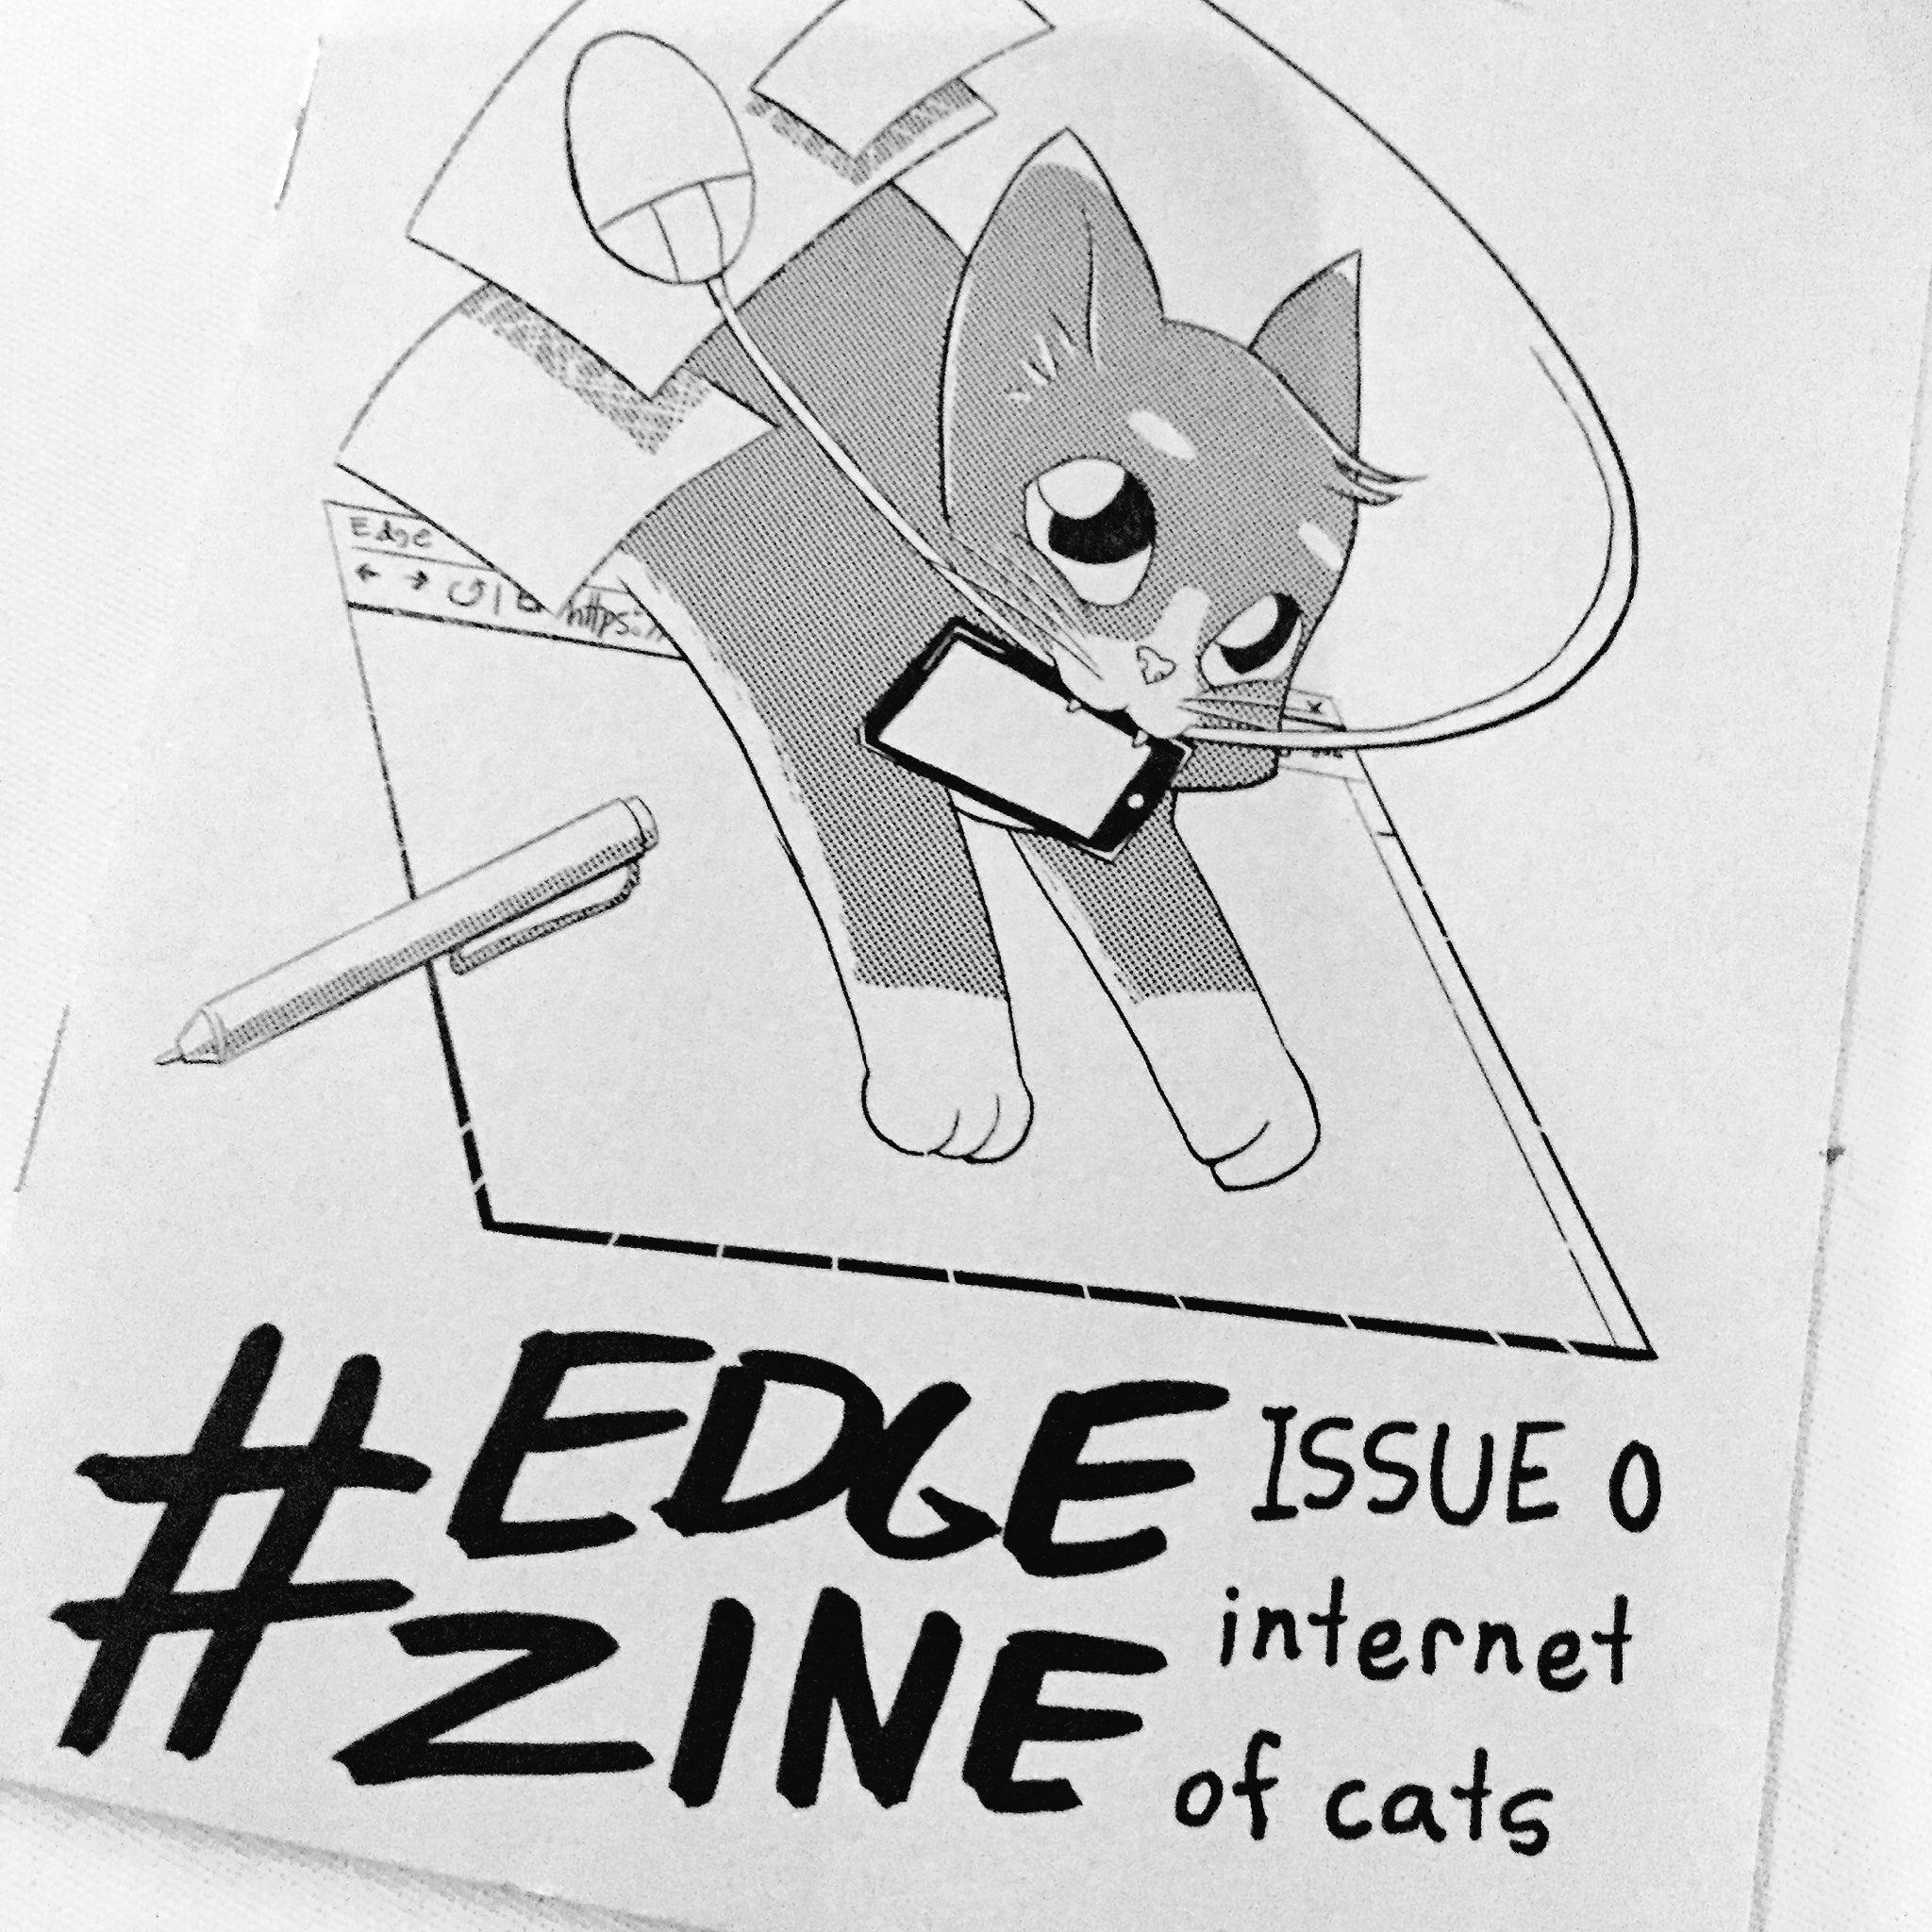 I got a super cool zine from @rachelnabors at #respond17 😍 https://t.co/dSZEUE3q68